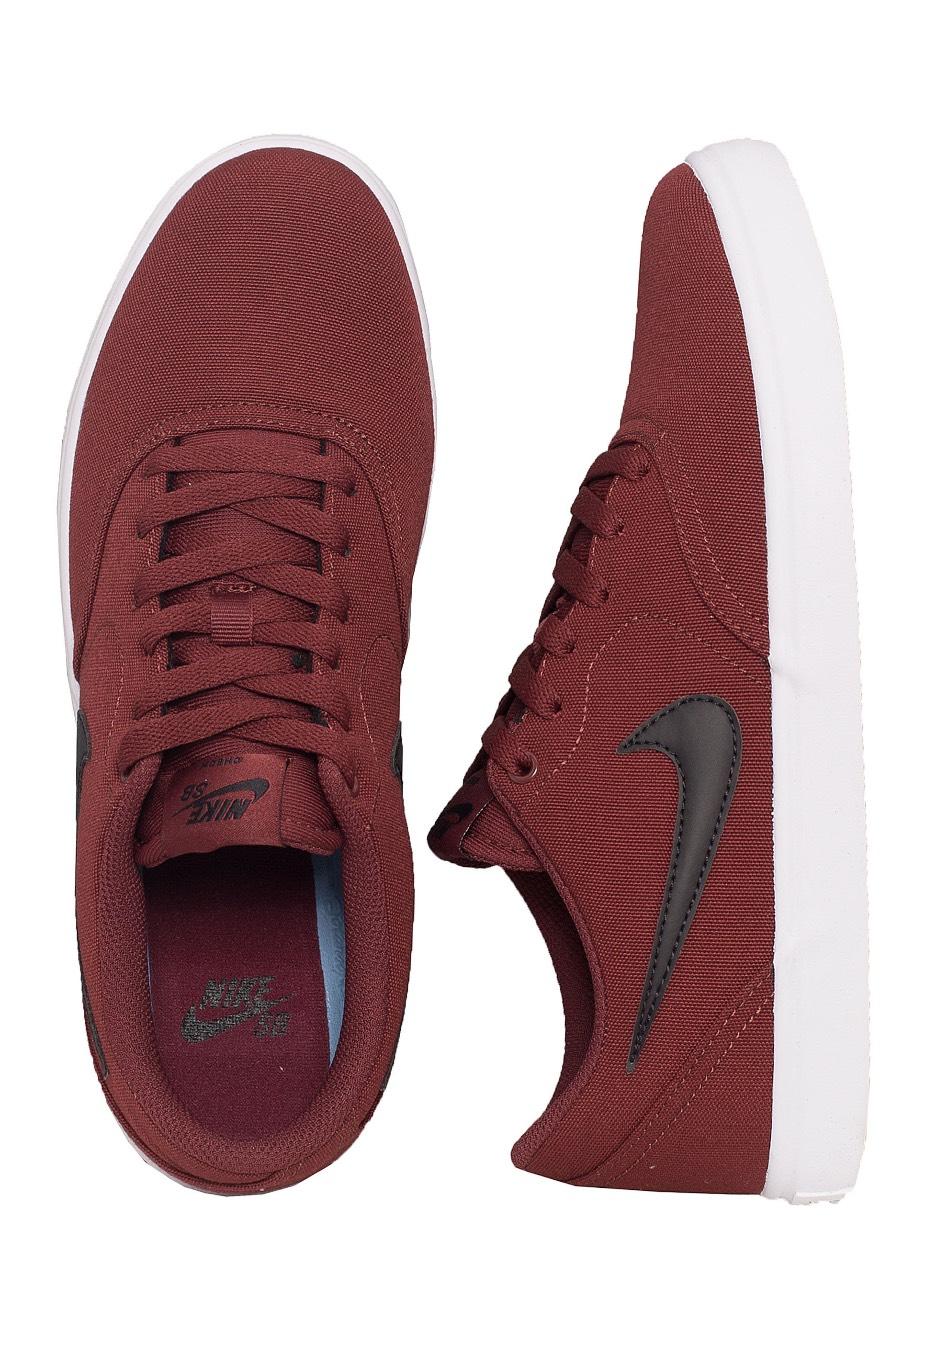 Nike - SB Check Solarsoft Canvas Skateboarding Dark Team Red Black White -  Shoes - Streetwear Shop - Impericon.com AU 3640c7fc8c6e